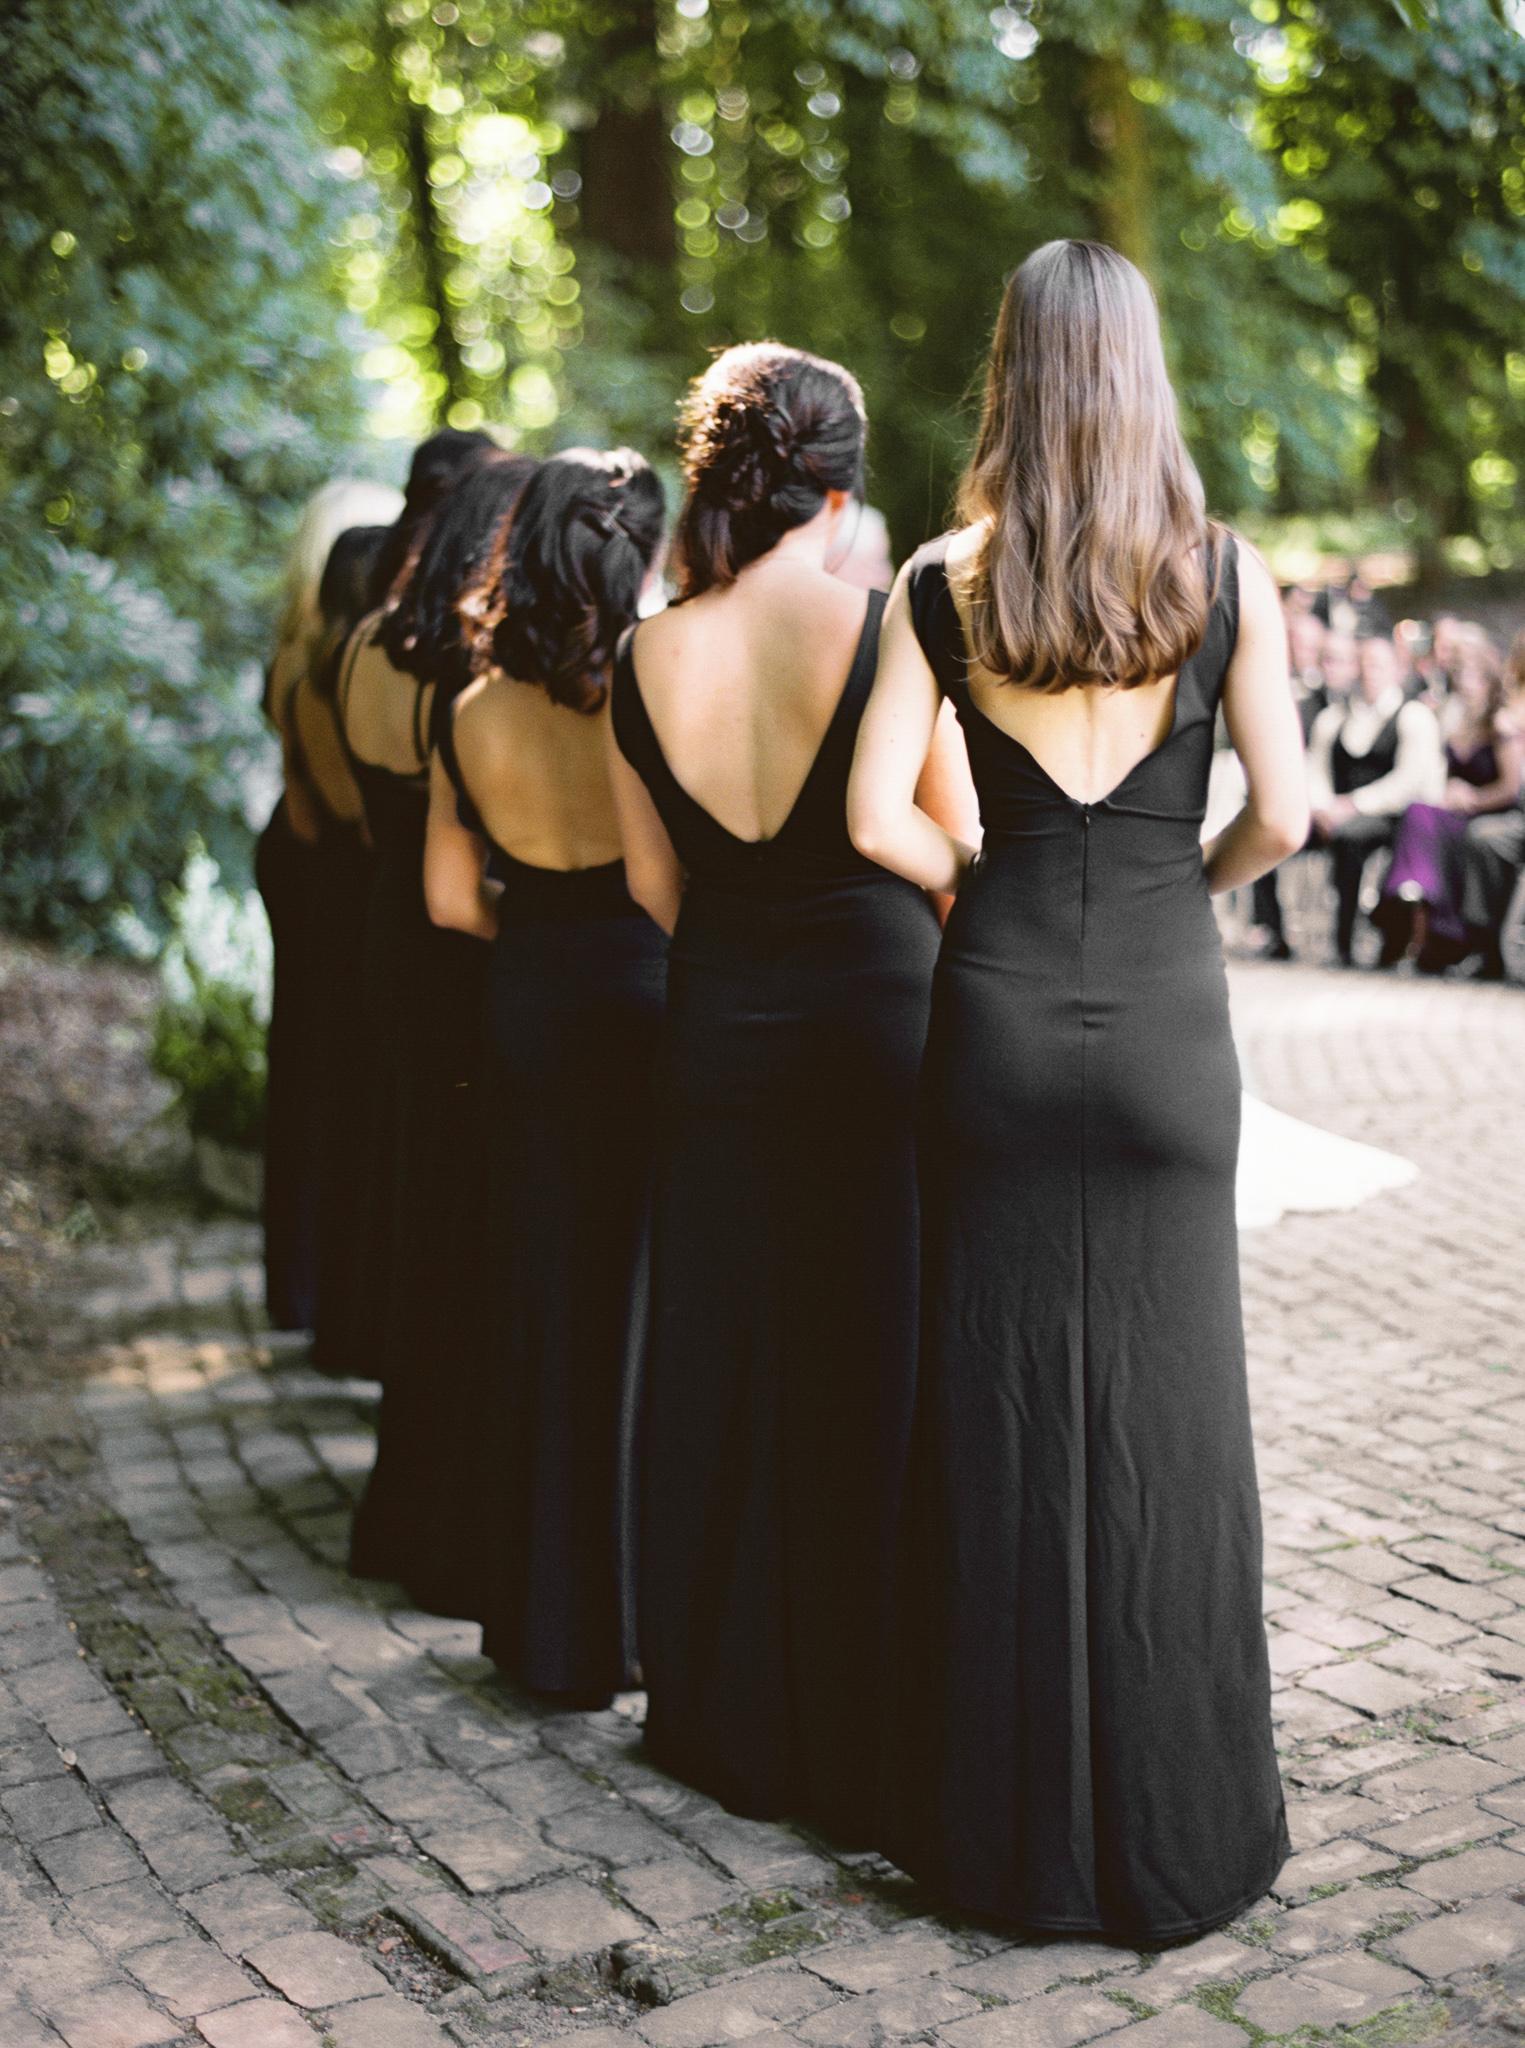 138OutliveCreative_Travel_Photographer_Videographer_Lewis&Clark_Oregon_Elegant_BlackTie_Destination_Wedding.jpg